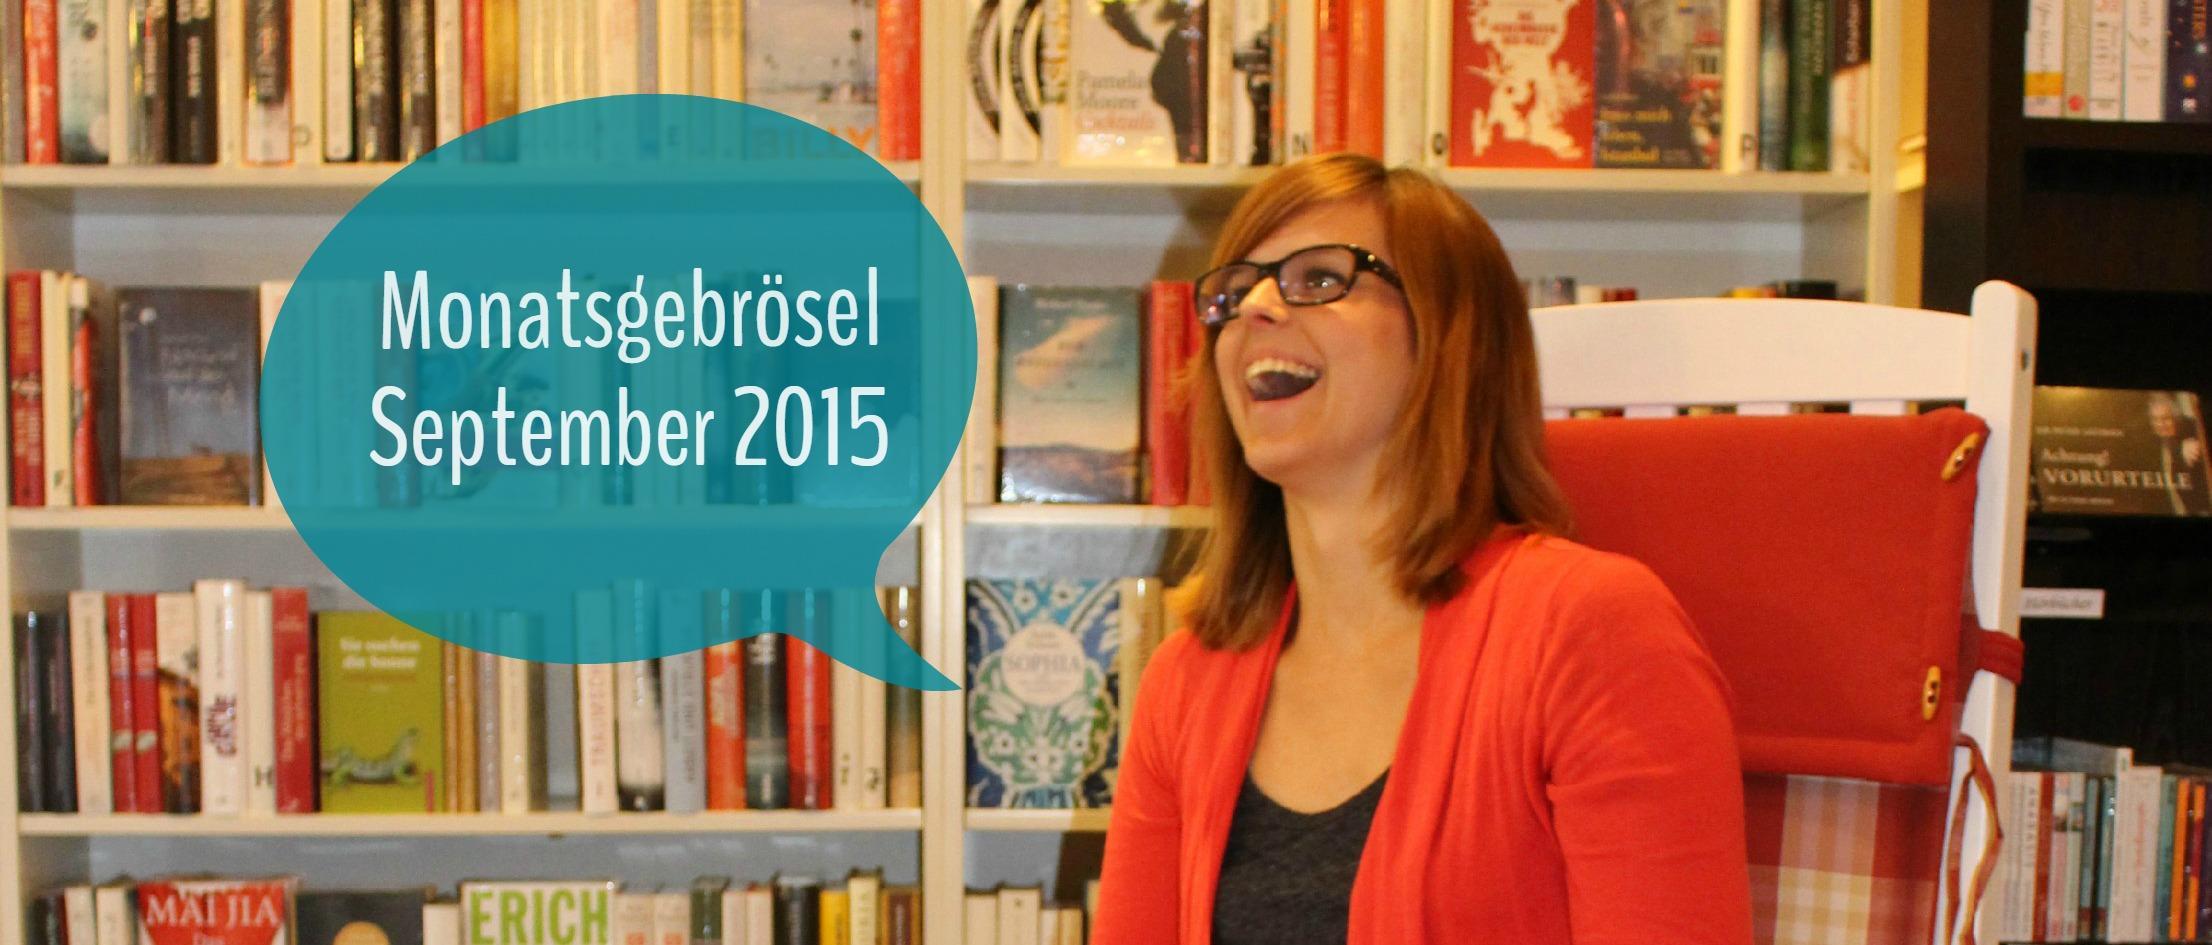 Monatsgebrösel-September2015-Beitragsbild